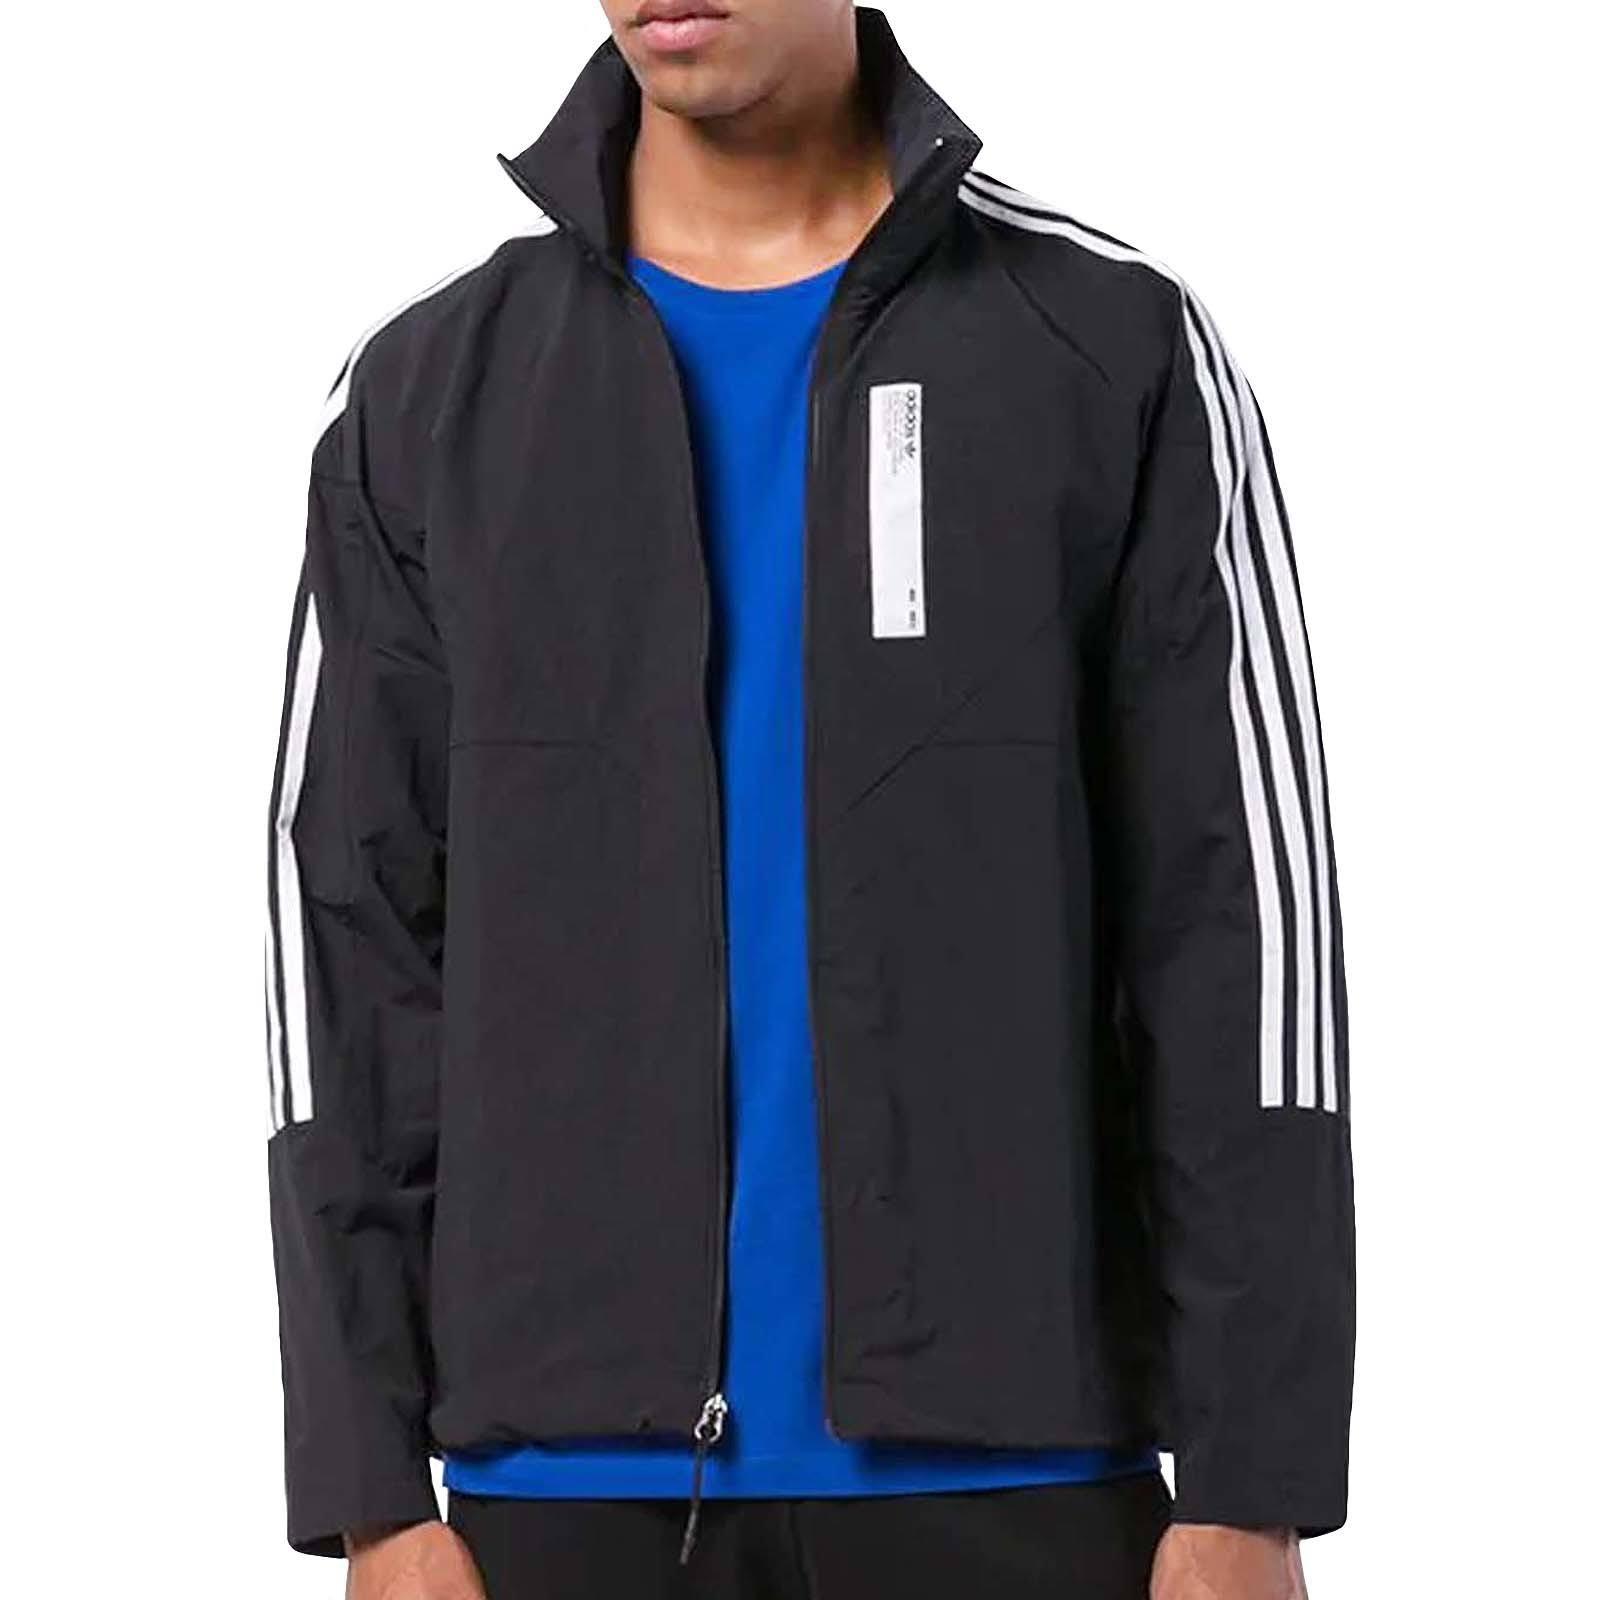 Adidas Originals NMD Track Top, Black, Size M, Men